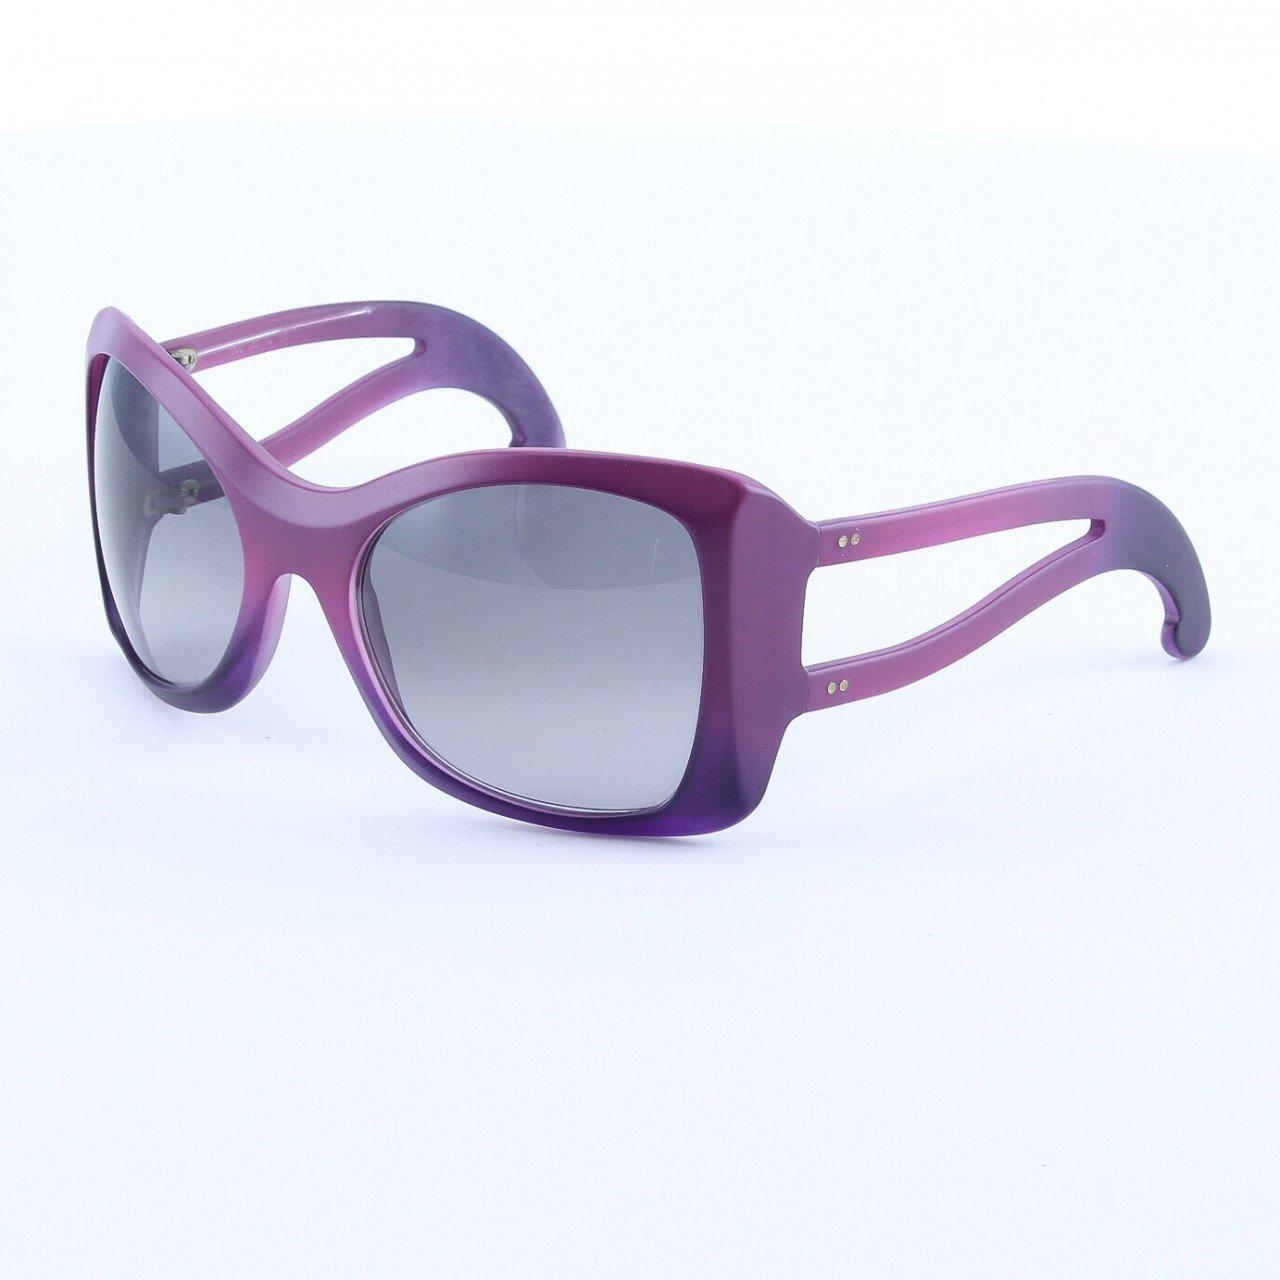 Marni MA150S Sunglasses Col. 02 Opaque Purple Graduating to Deep Purple with Gray Lenses